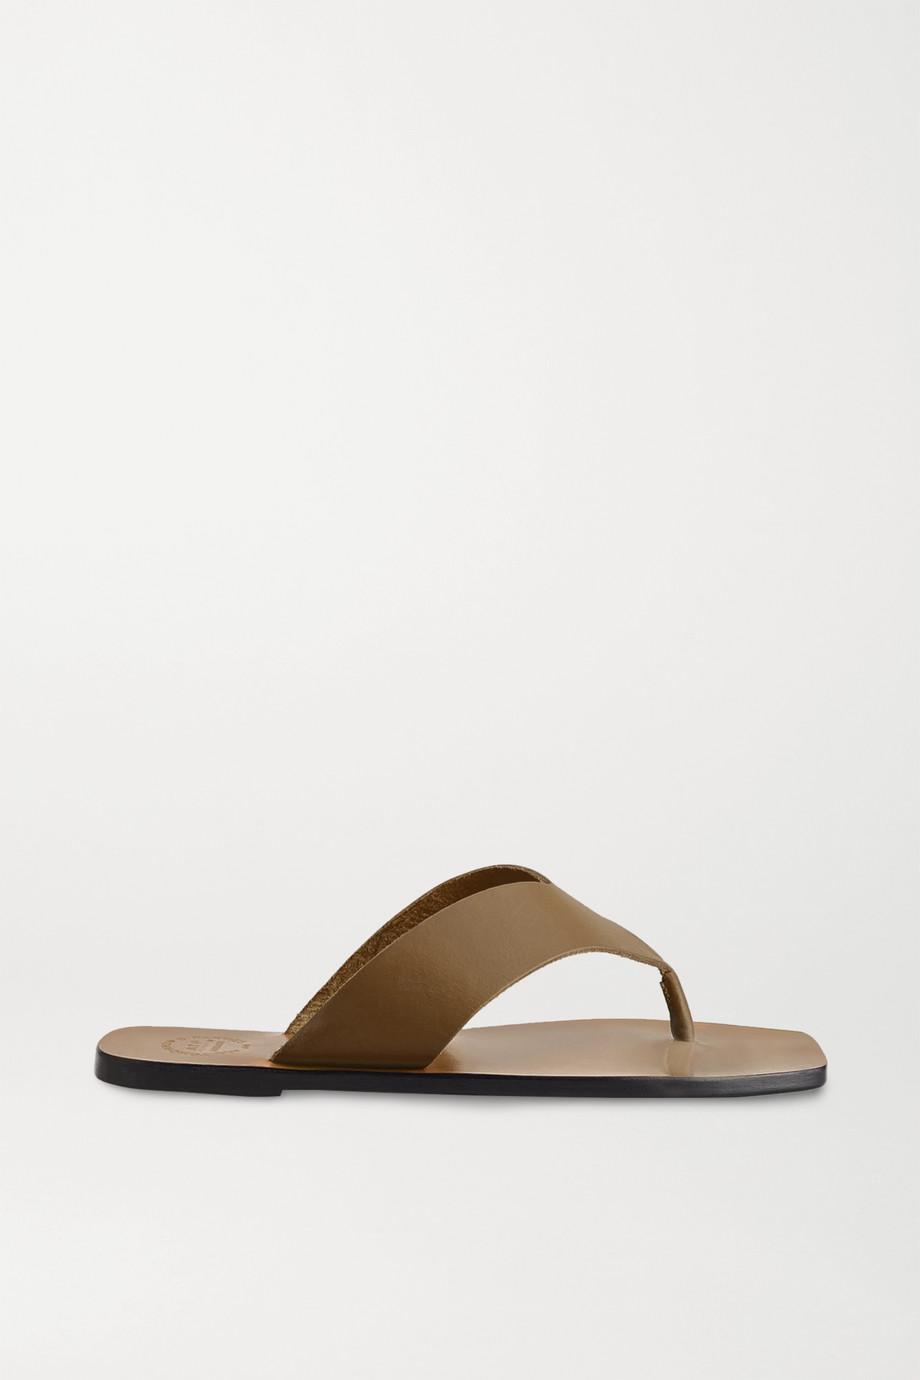 ATP Atelier Merine leather flip flops